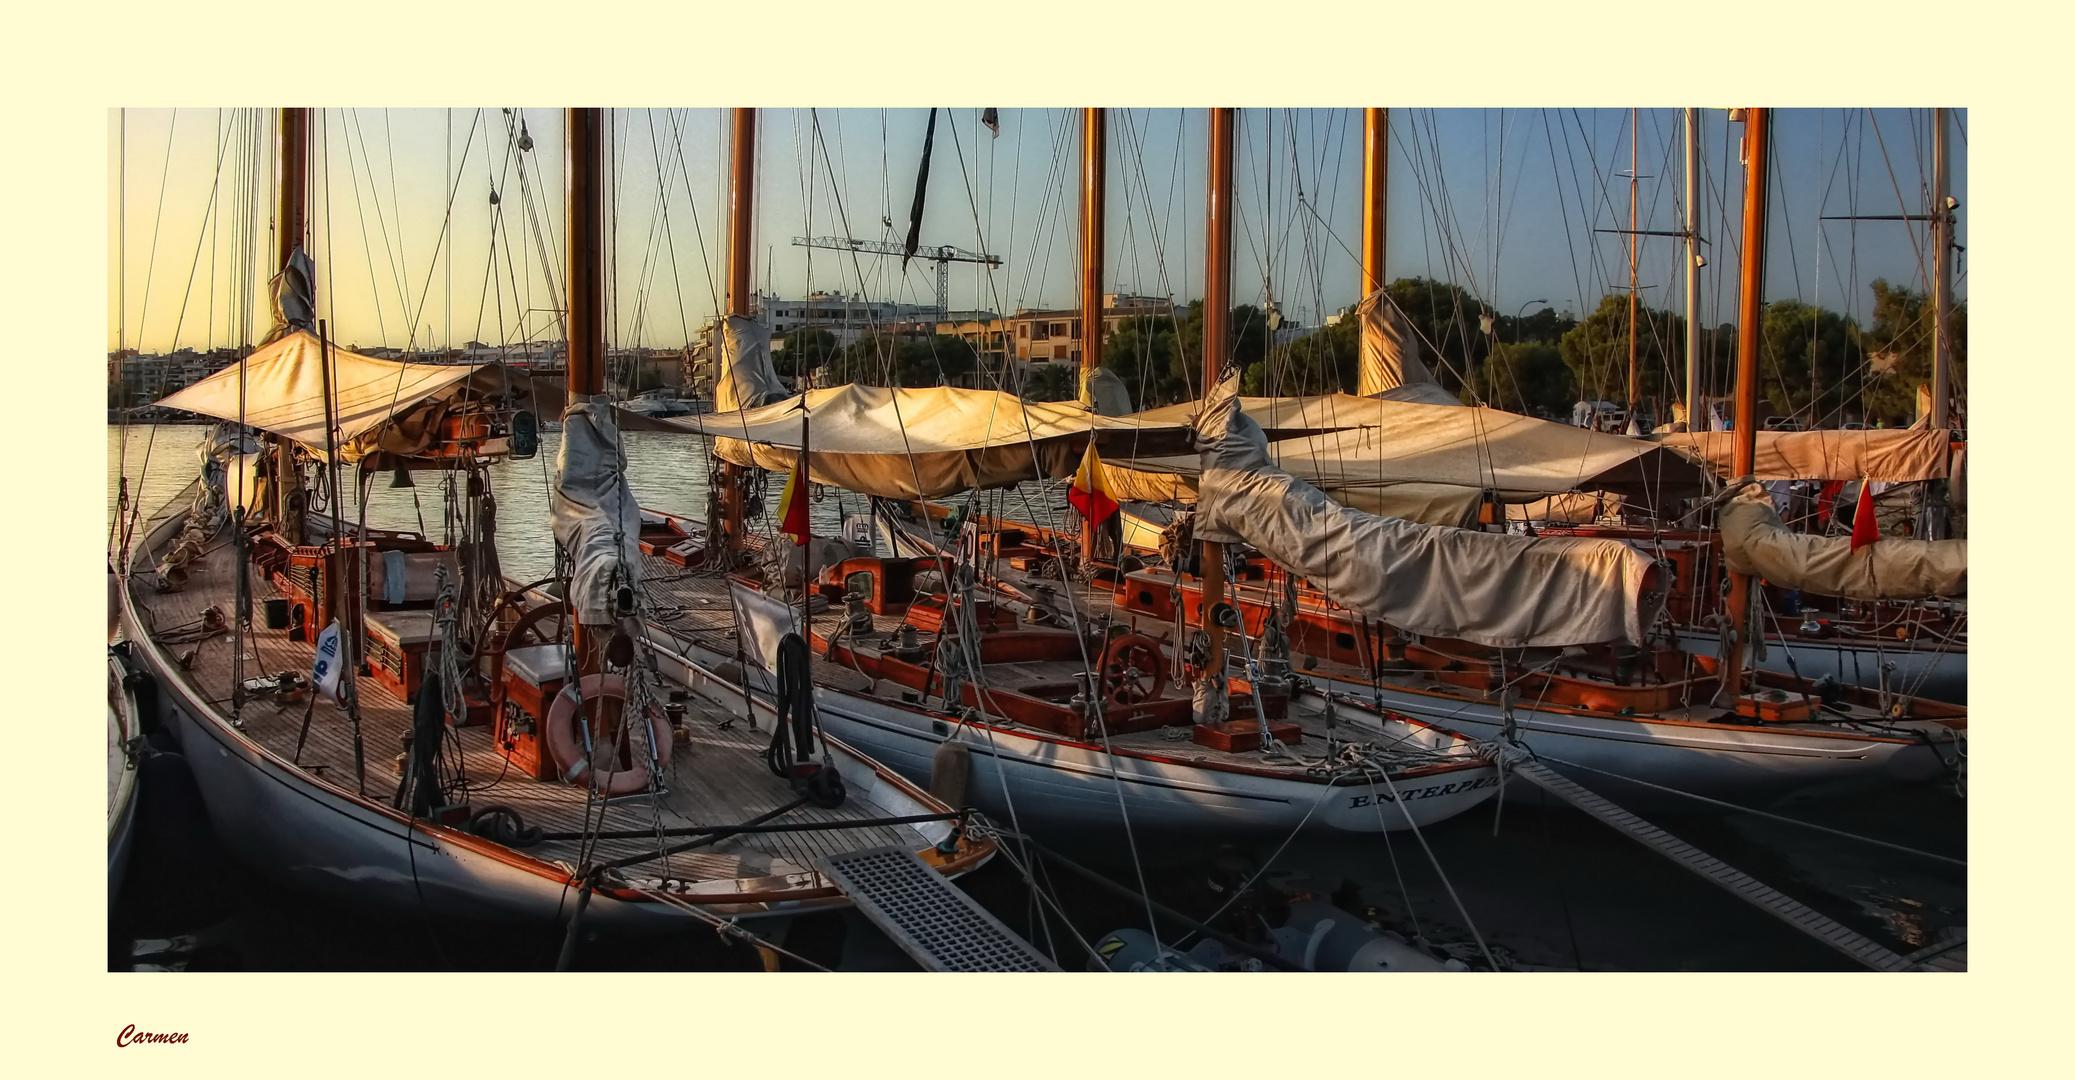 Barcos de época